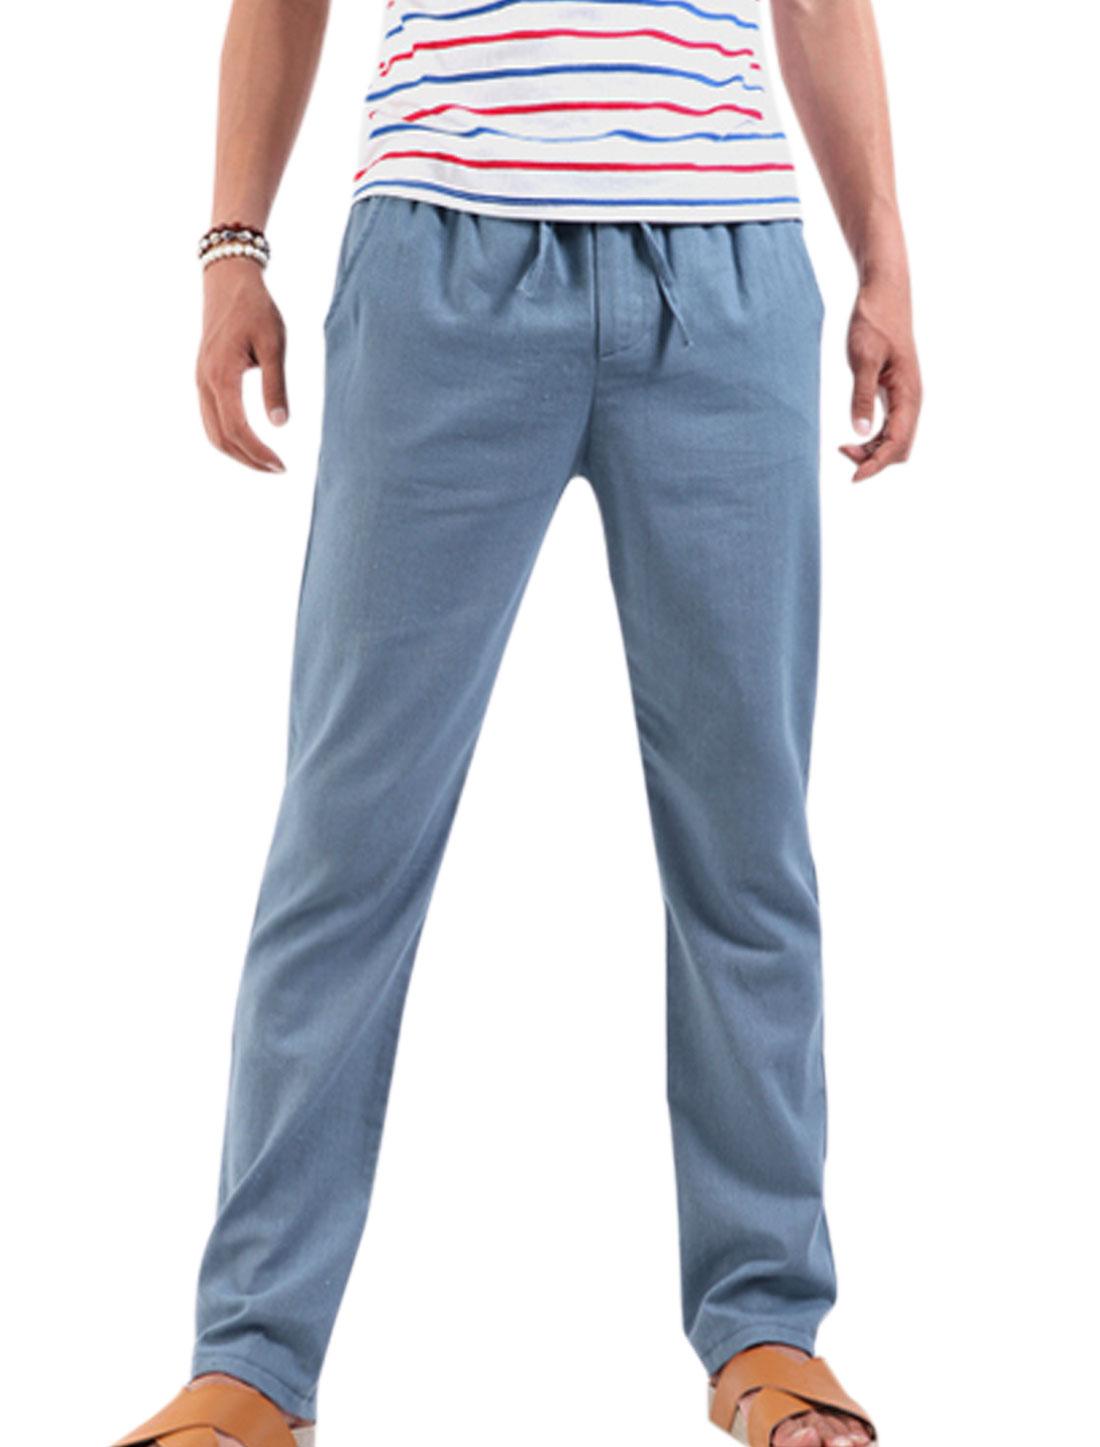 Men Stretchy Drawstring Waist Zipped Front Pants Lavender W28